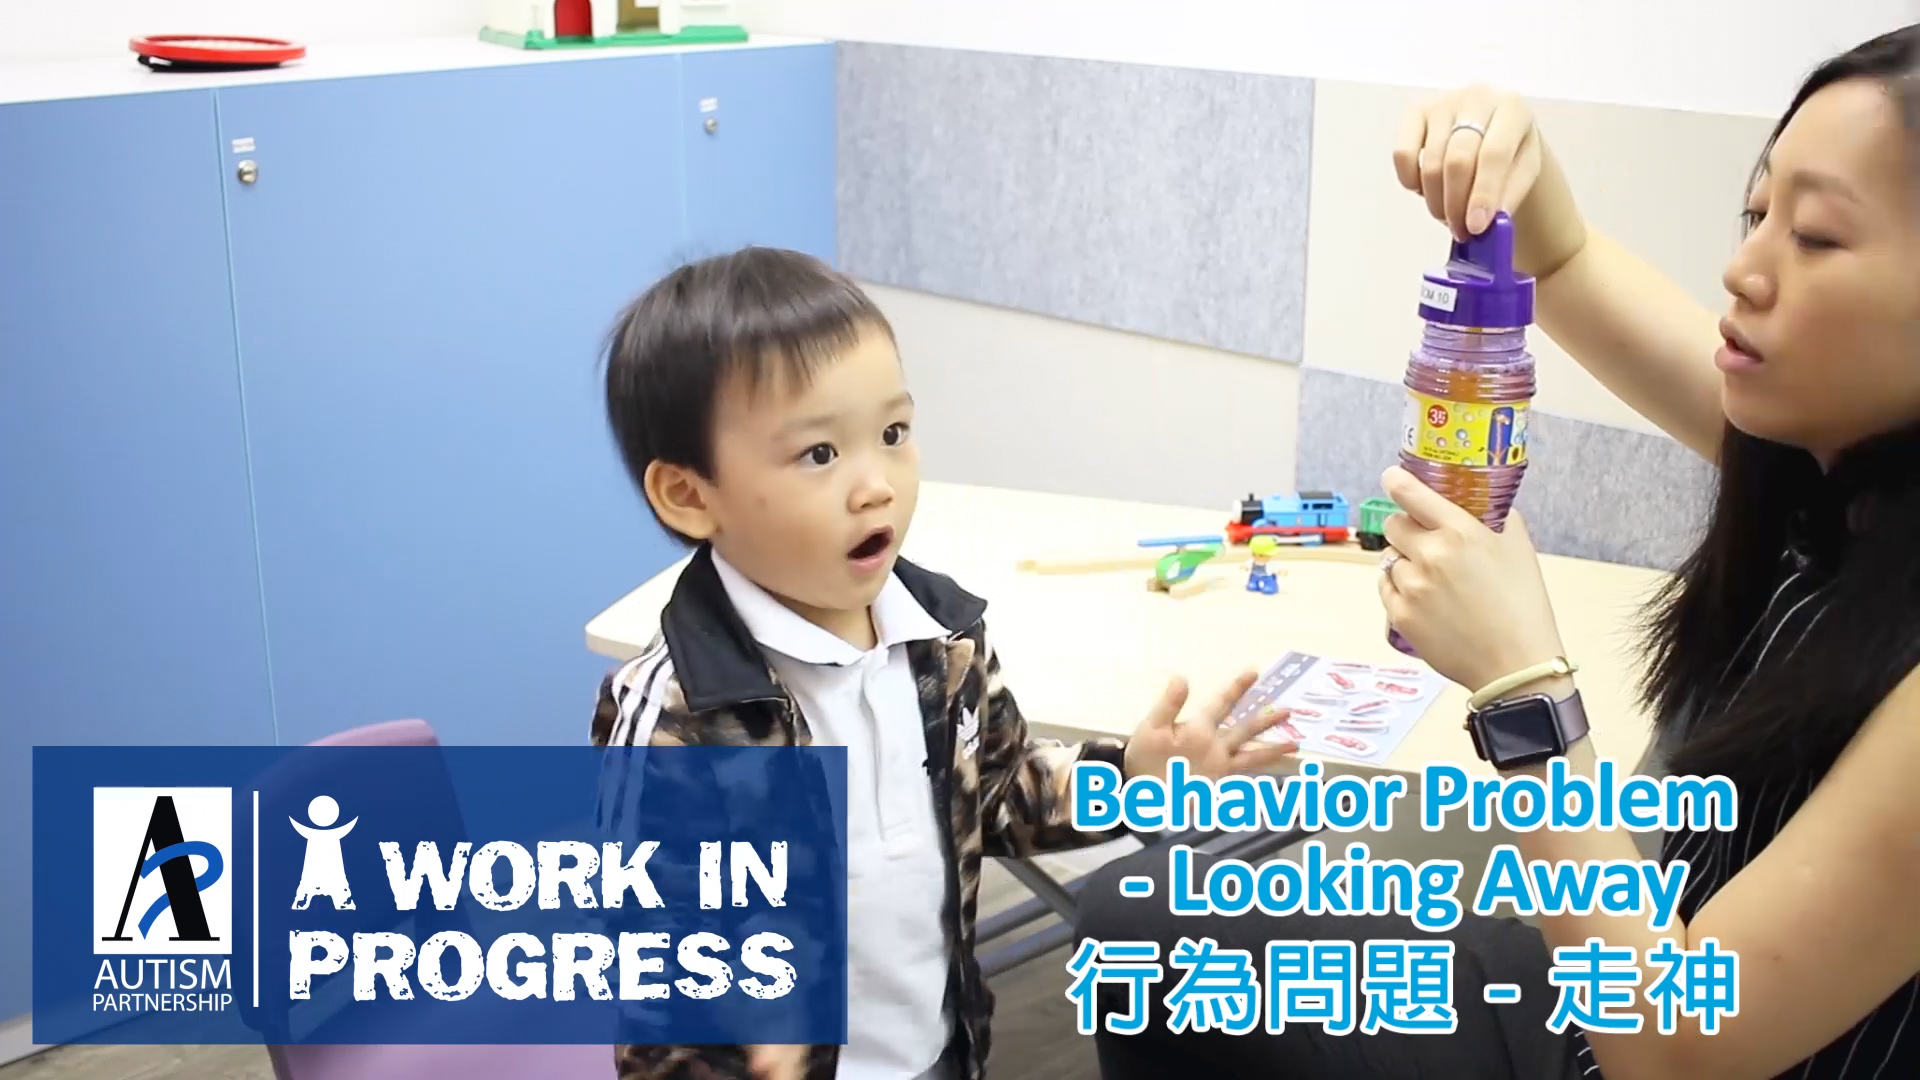 a-work-in-progress-kimi-behavior-problem-looking-away-eye-token